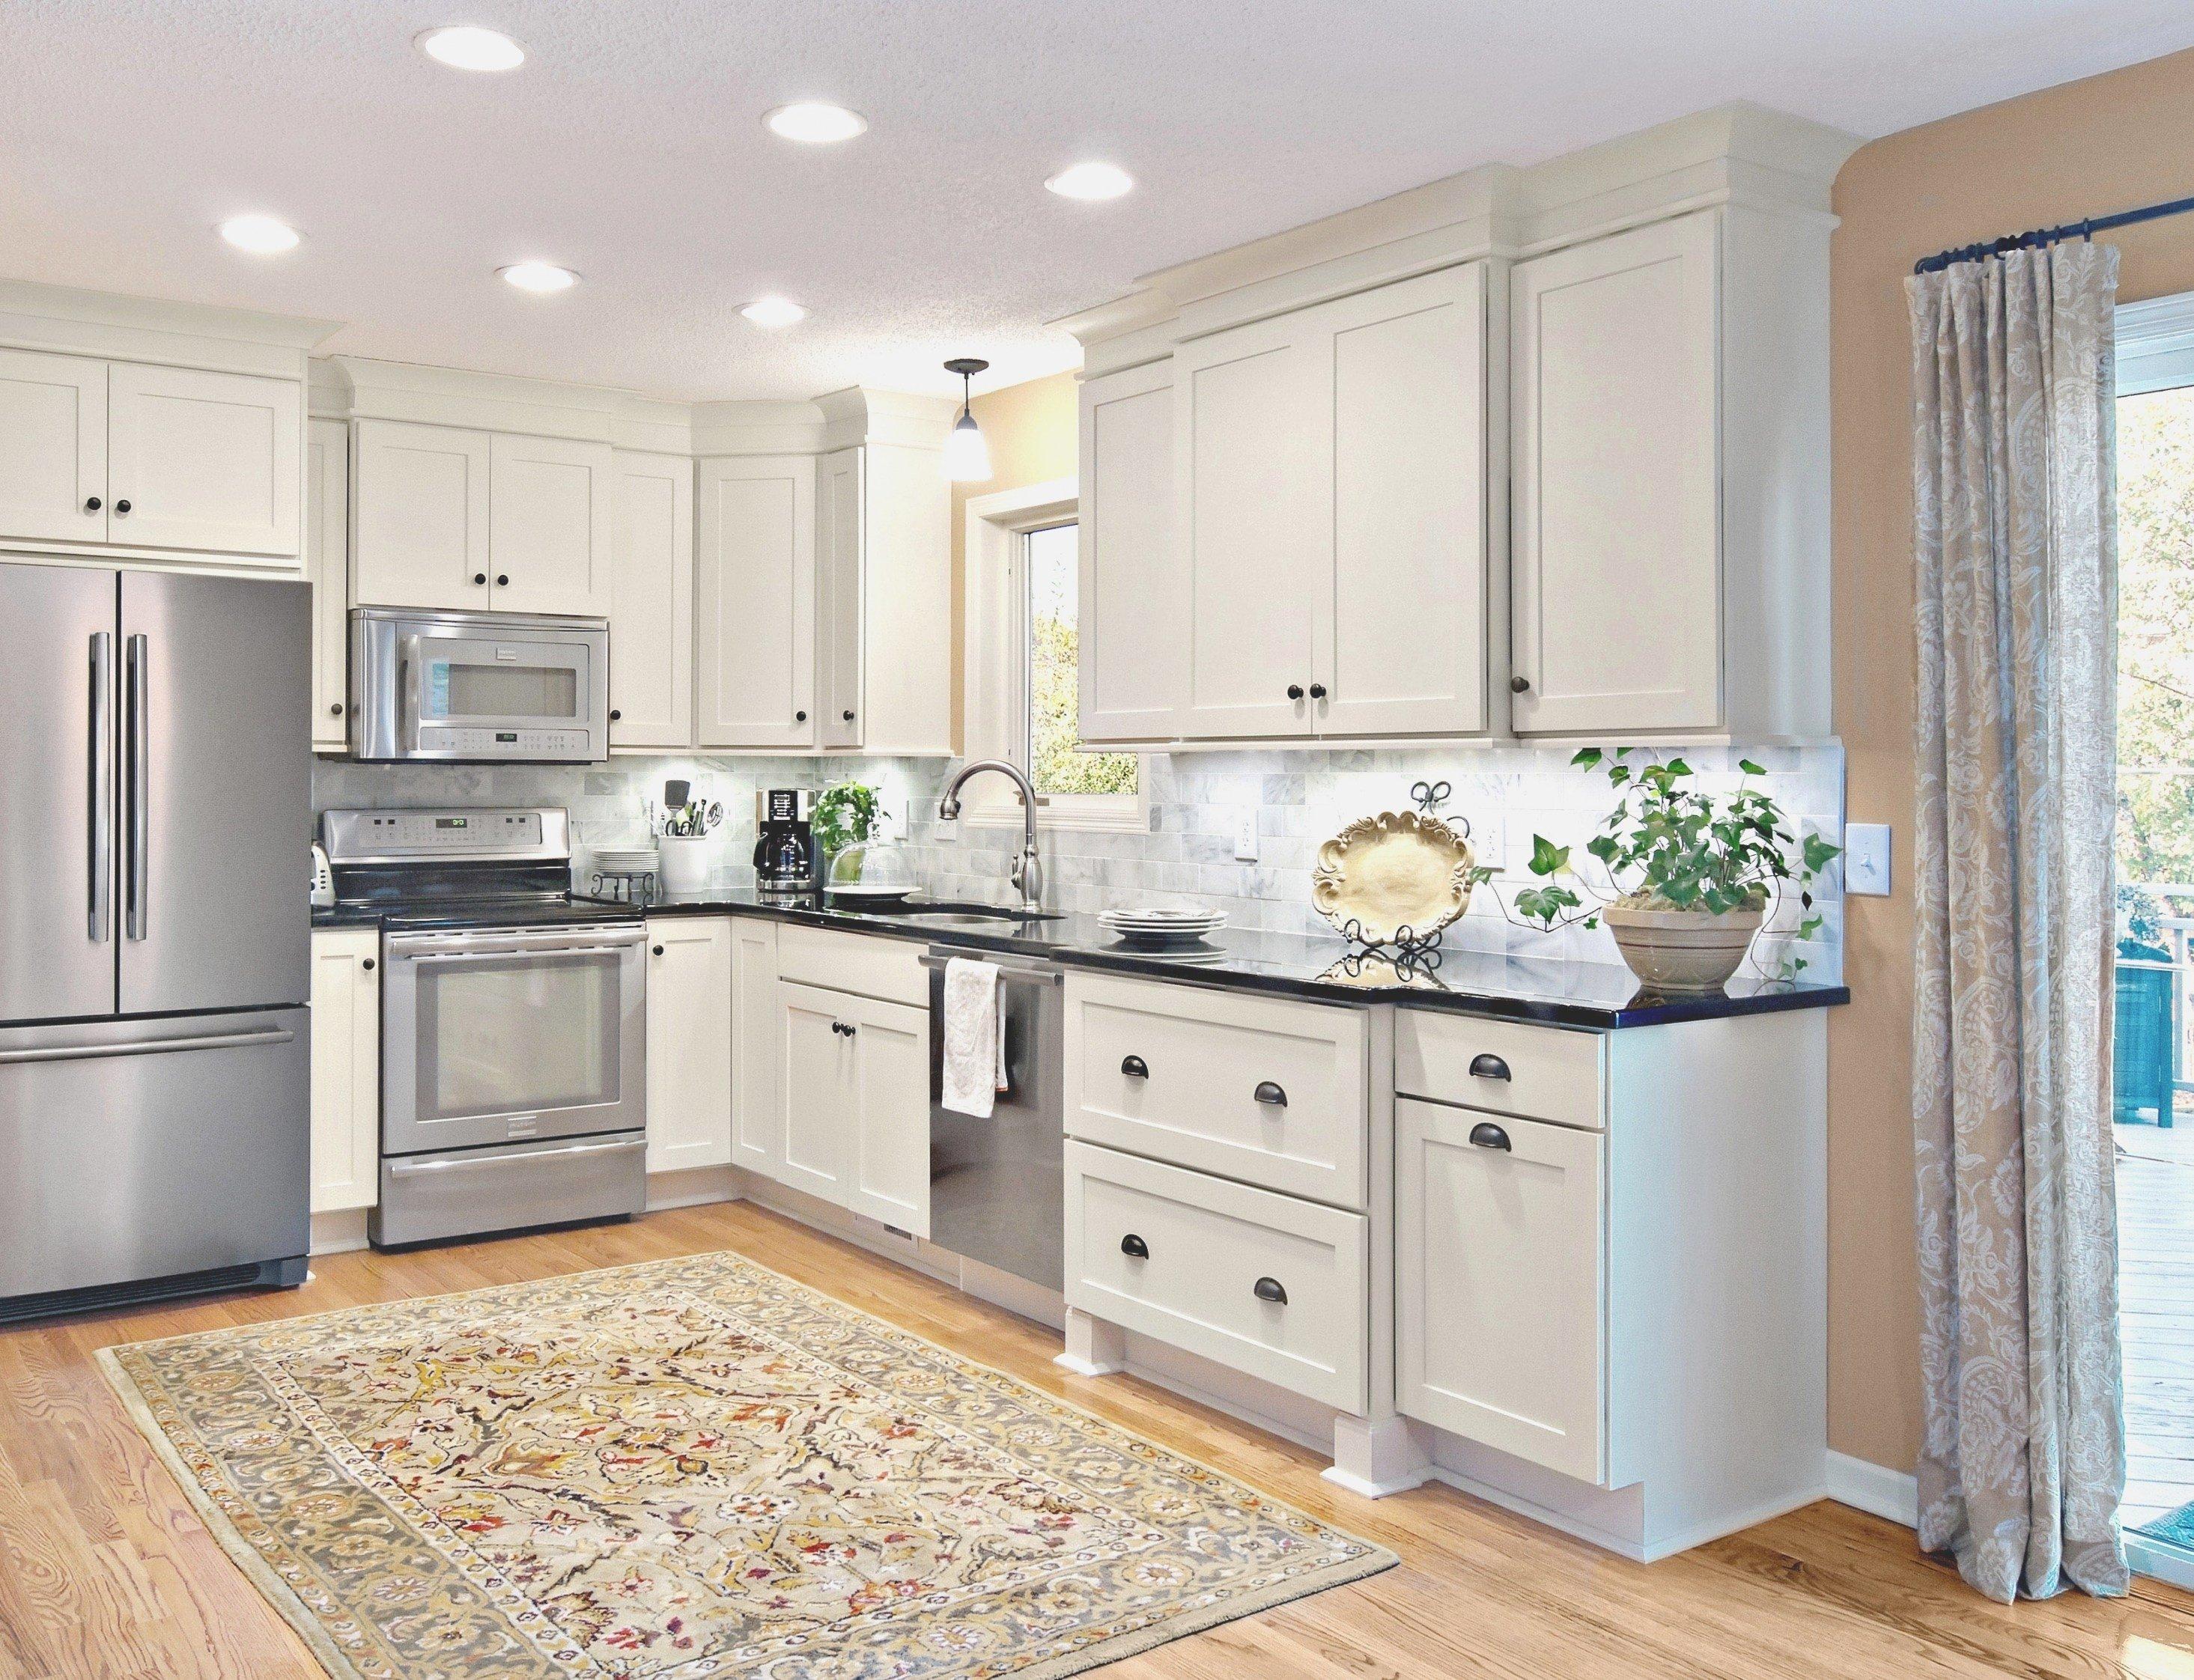 10 Beautiful Kitchen Cabinet Crown Molding Ideas